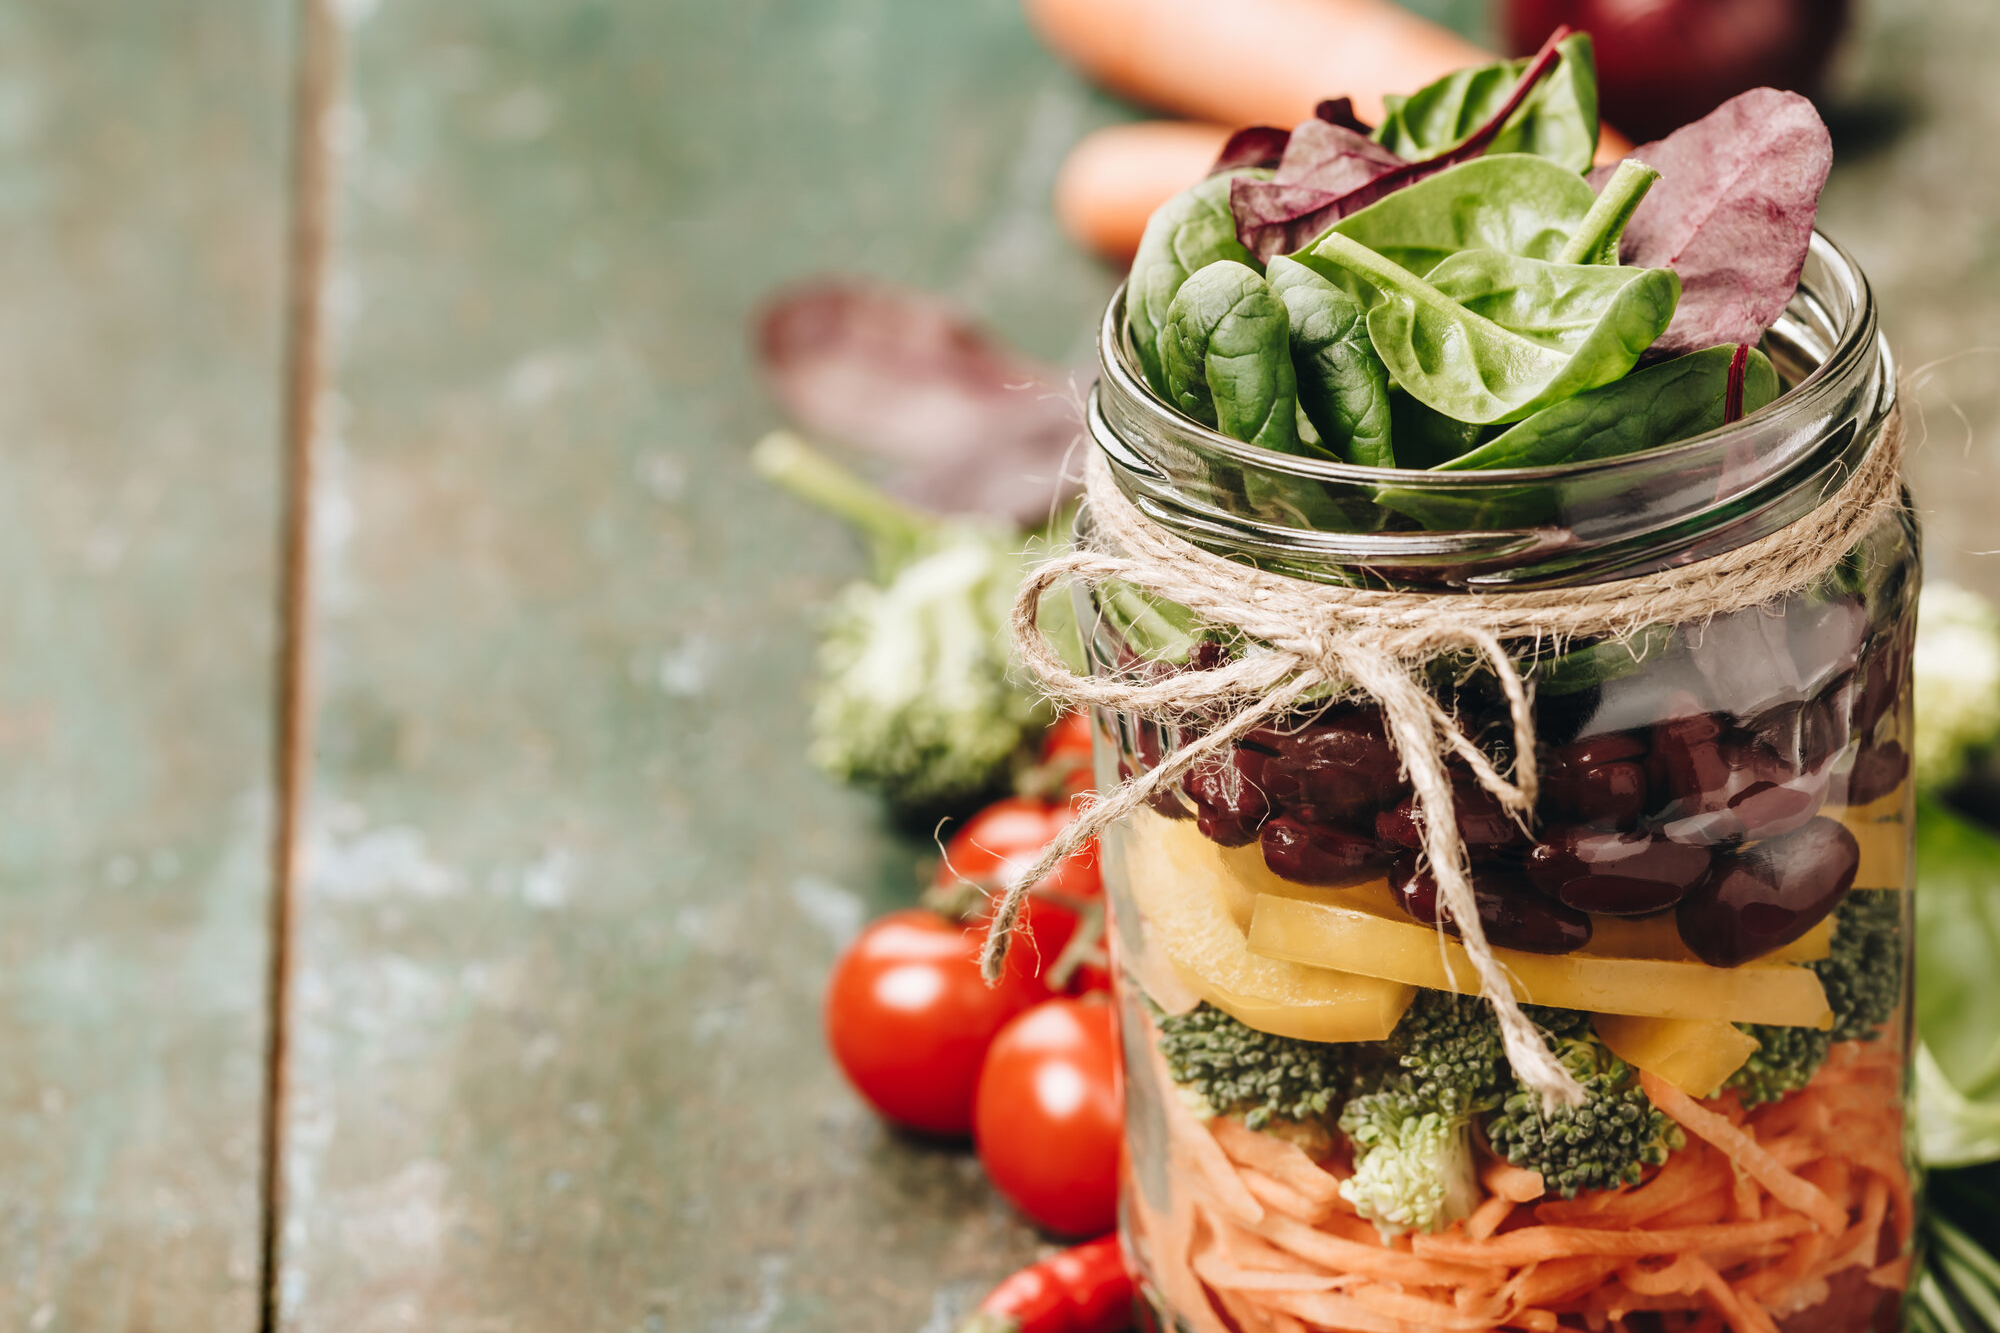 healthy homemade mason jar salad UKZ3PK811.jpg - Startseite